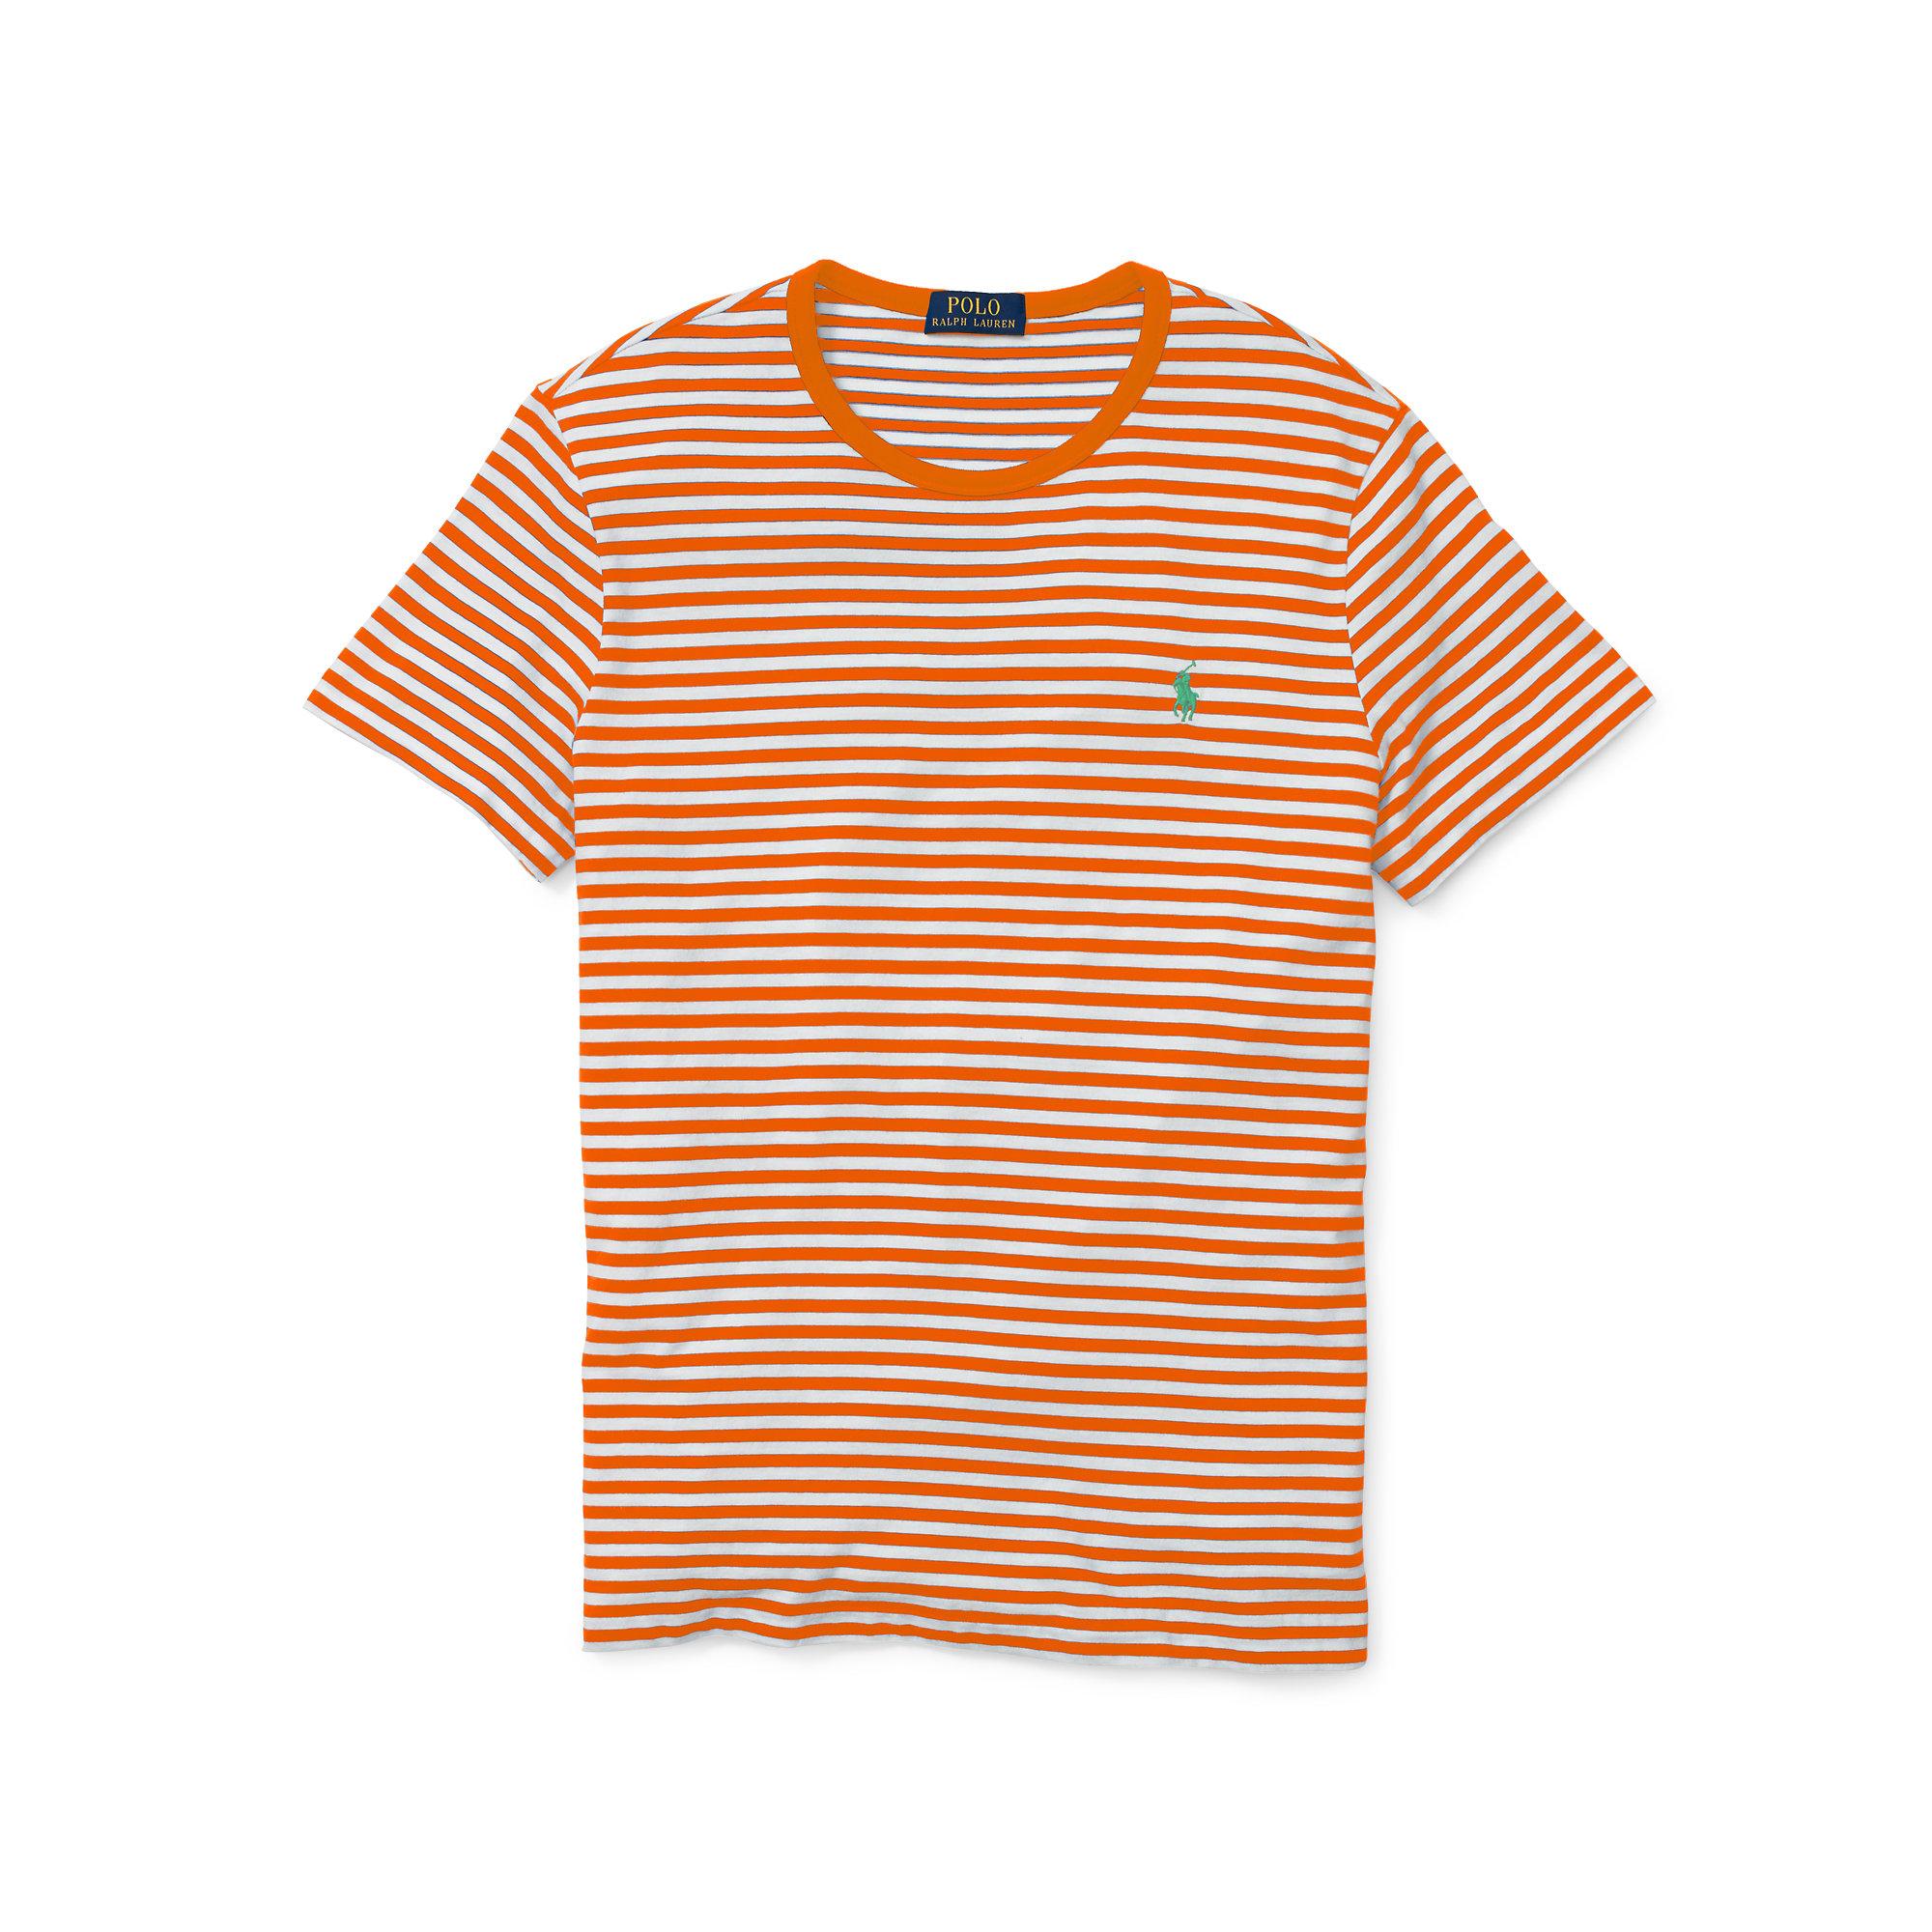 Polo ralph lauren Striped Cotton Jersey T-shirt in Orange ...